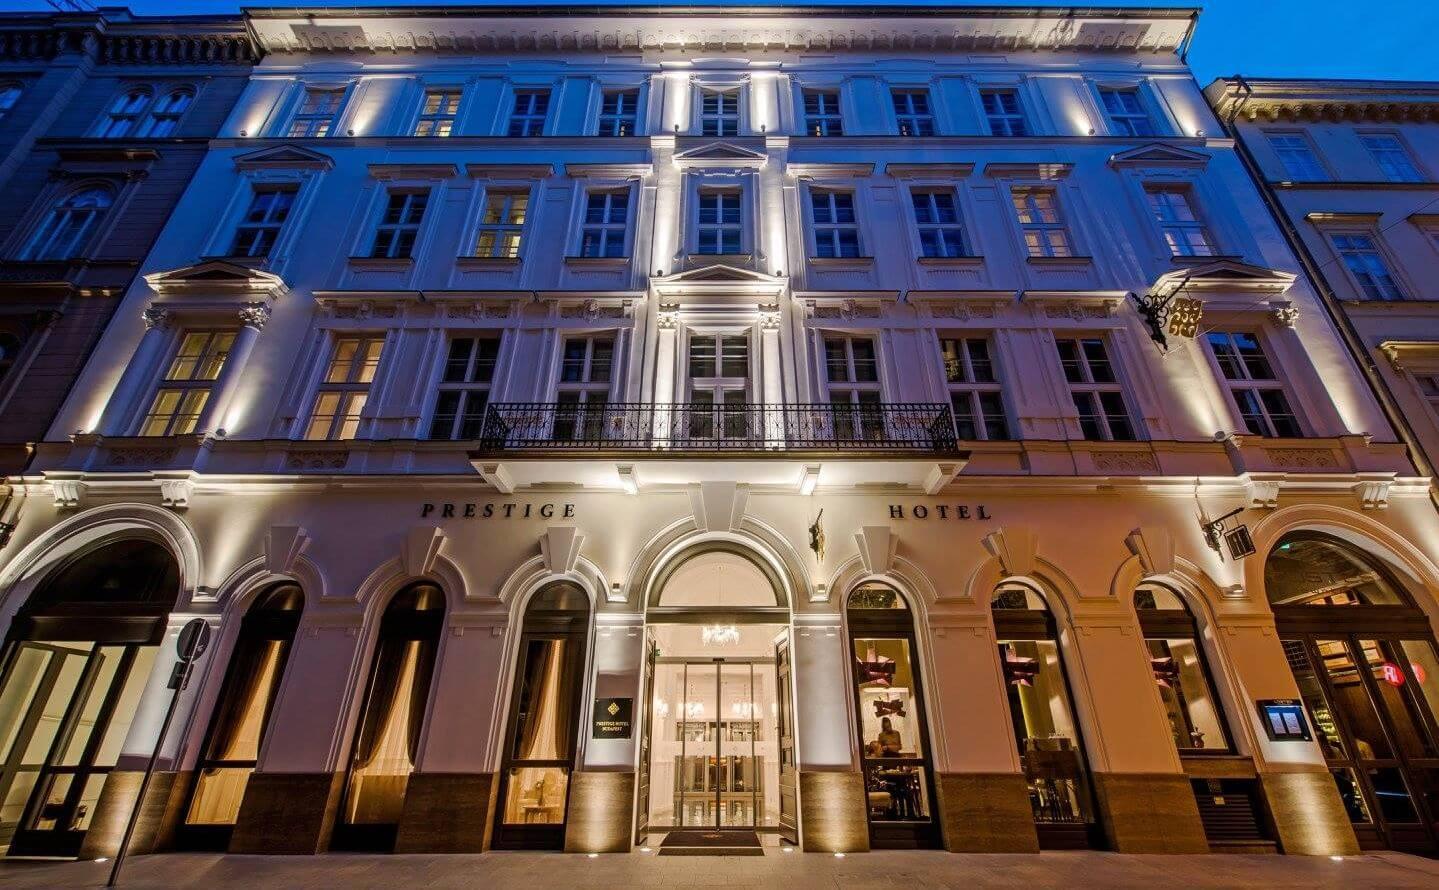 Prestige Hotel Budapest בתי מלון מרכזיים בבודפשט הונגריה מלון פרסטיז' 4 כוכבים